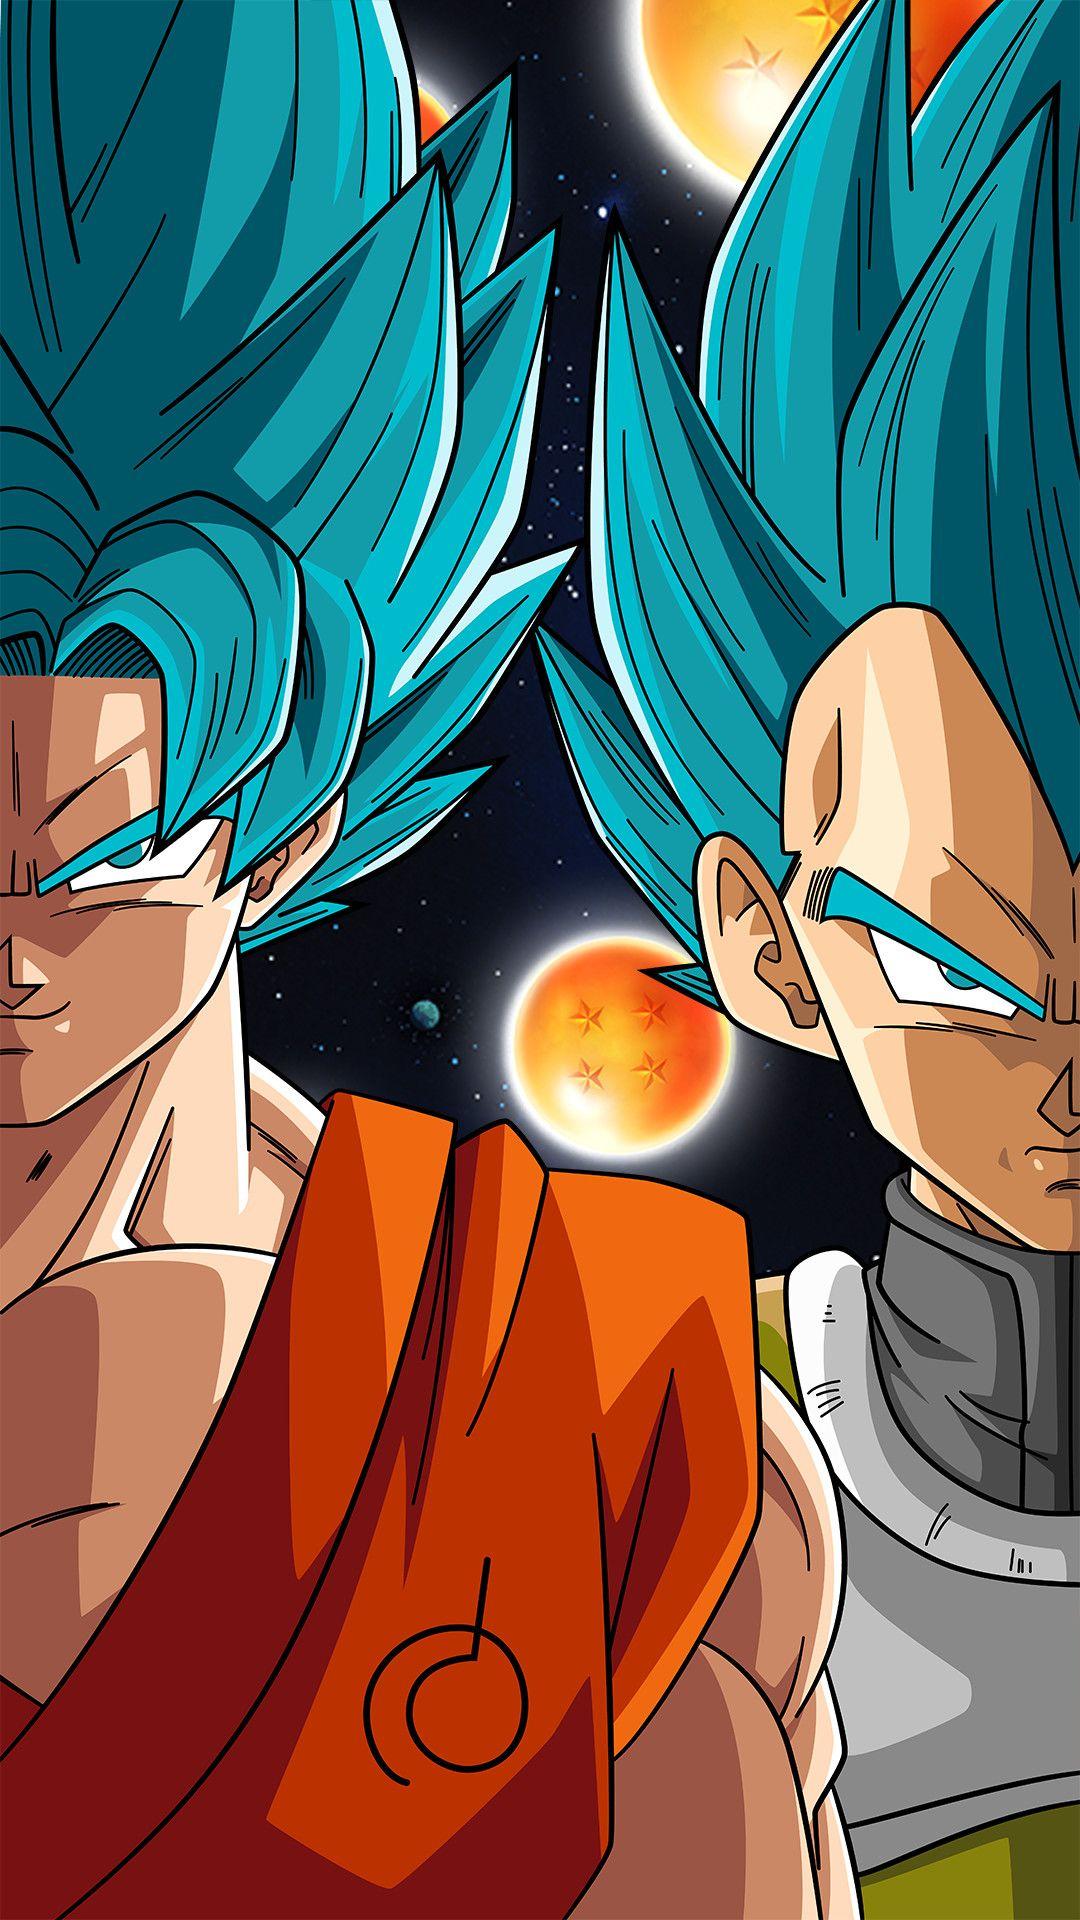 Super Saiyan Goku Wallpaper Home Screen in 2020 (With